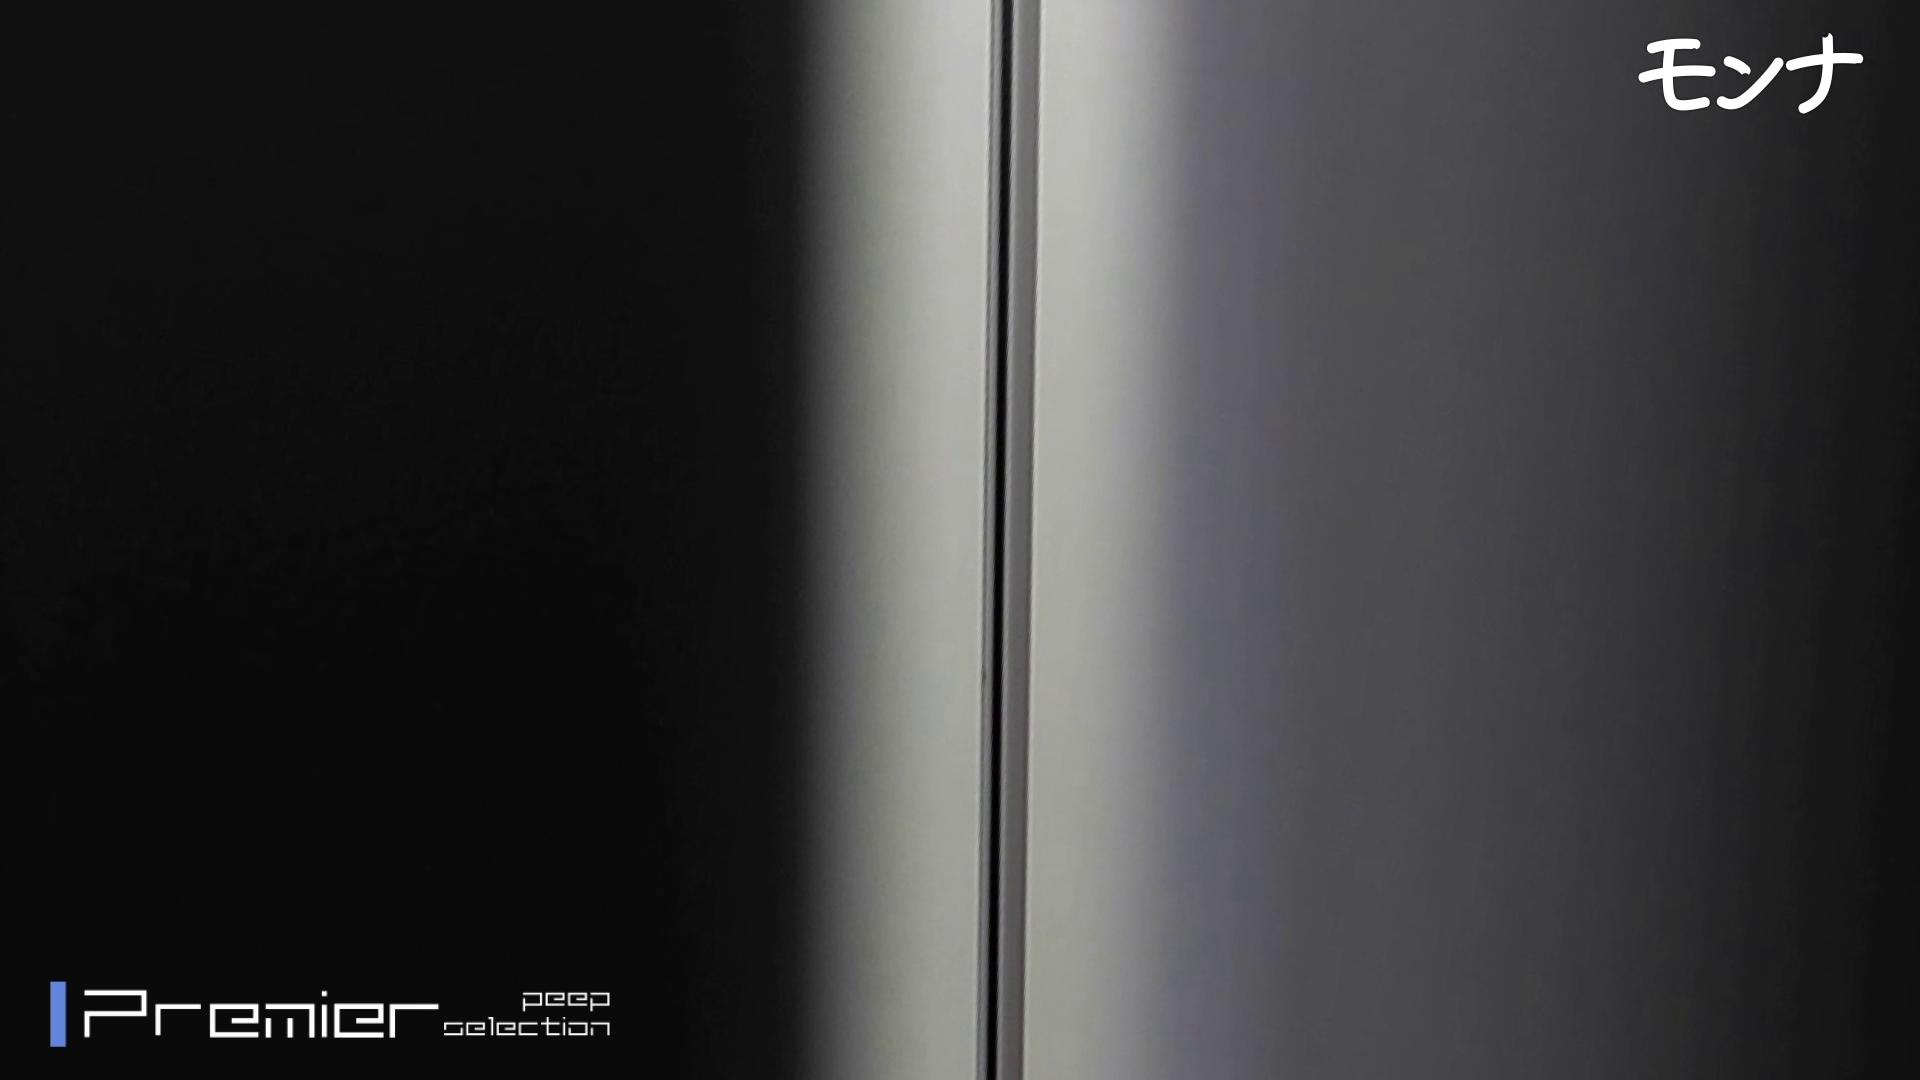 CM 悶絶シリーズ5 【美しい日本の未来 No.128】 高評価 セックス画像 58画像 38